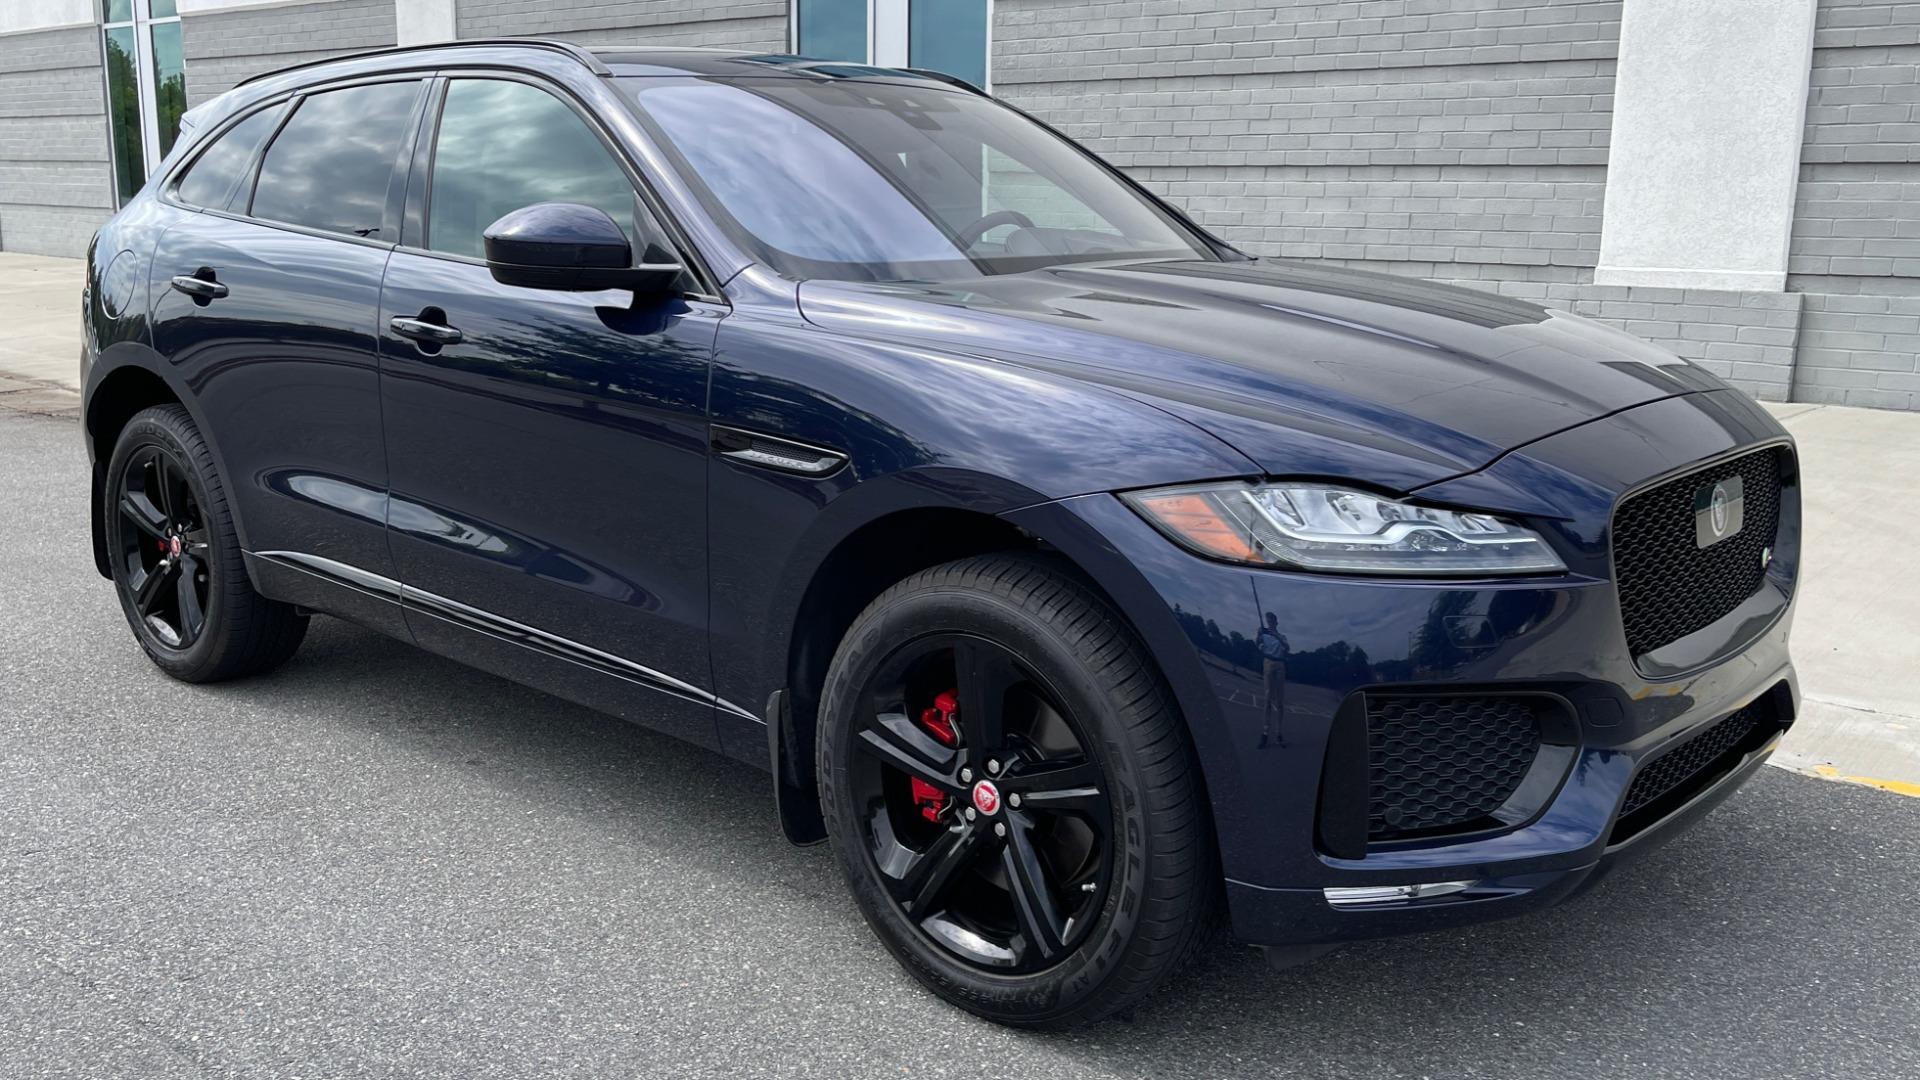 Used 2019 Jaguar F-PACE S / DRIVE PKG / BSA / HUD / BLACK EXT PKG / REARVIEW for sale $50,995 at Formula Imports in Charlotte NC 28227 6